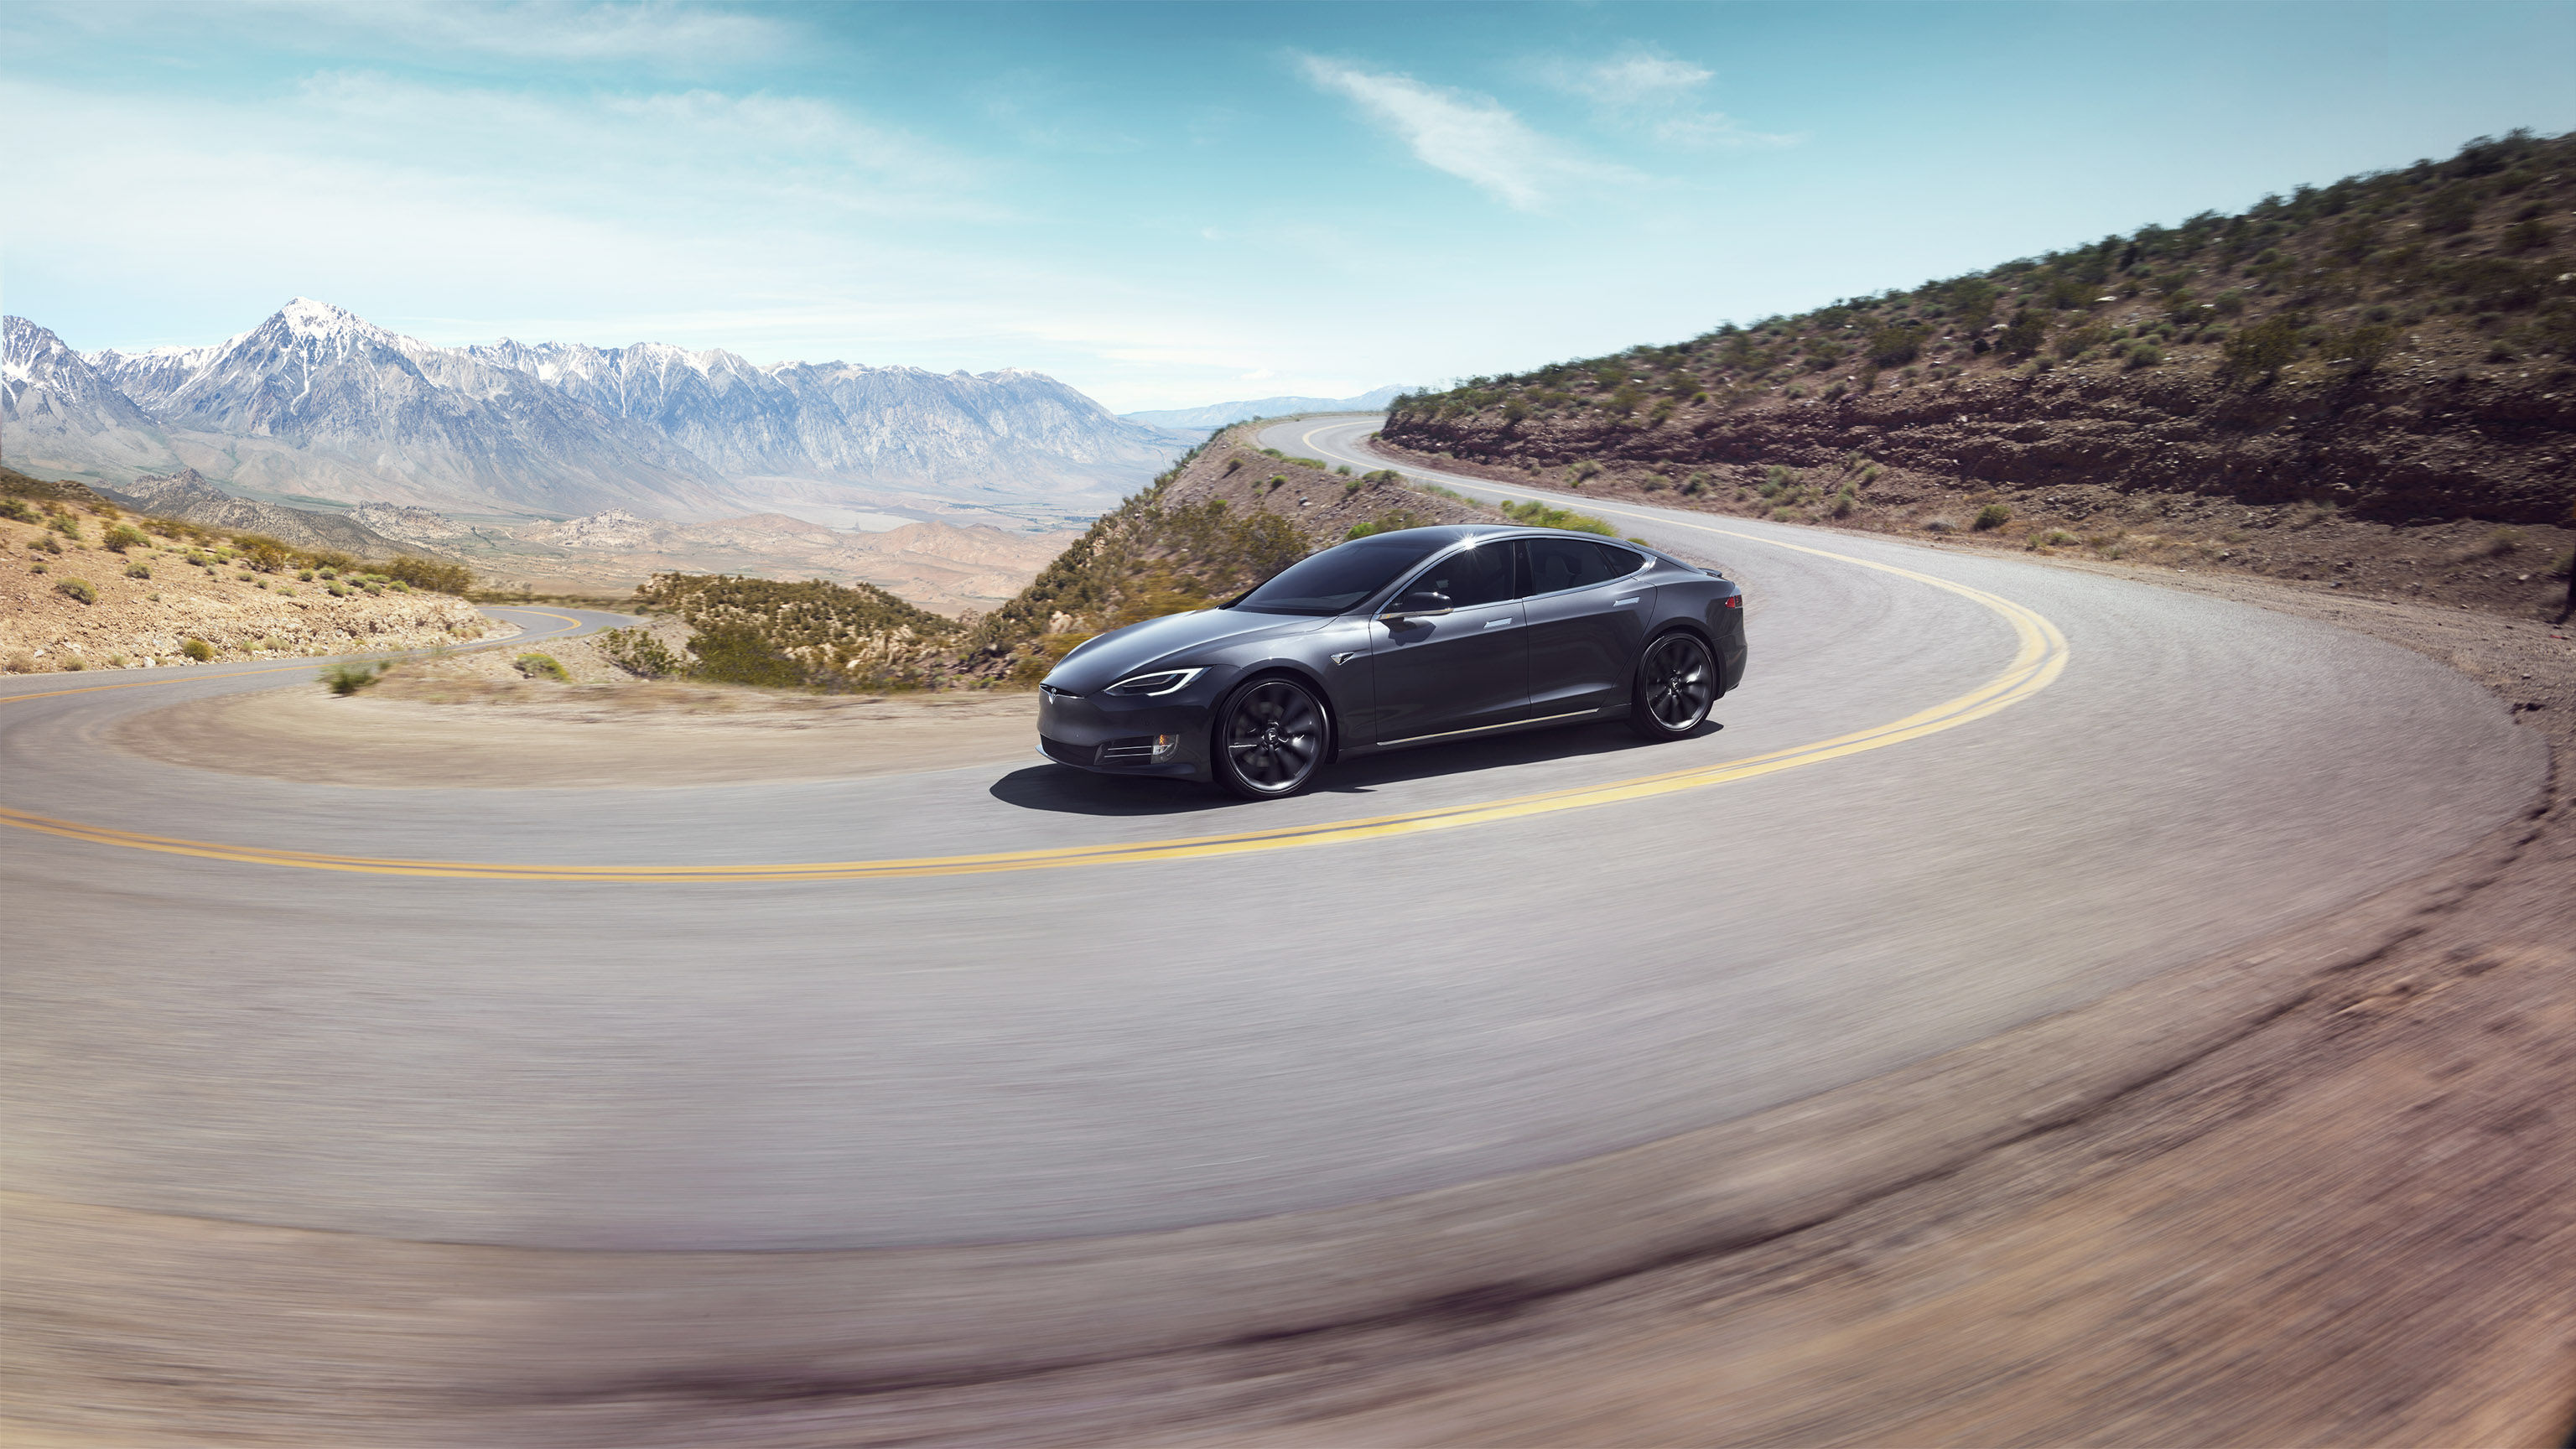 2018 Tesla Model S Desert curve